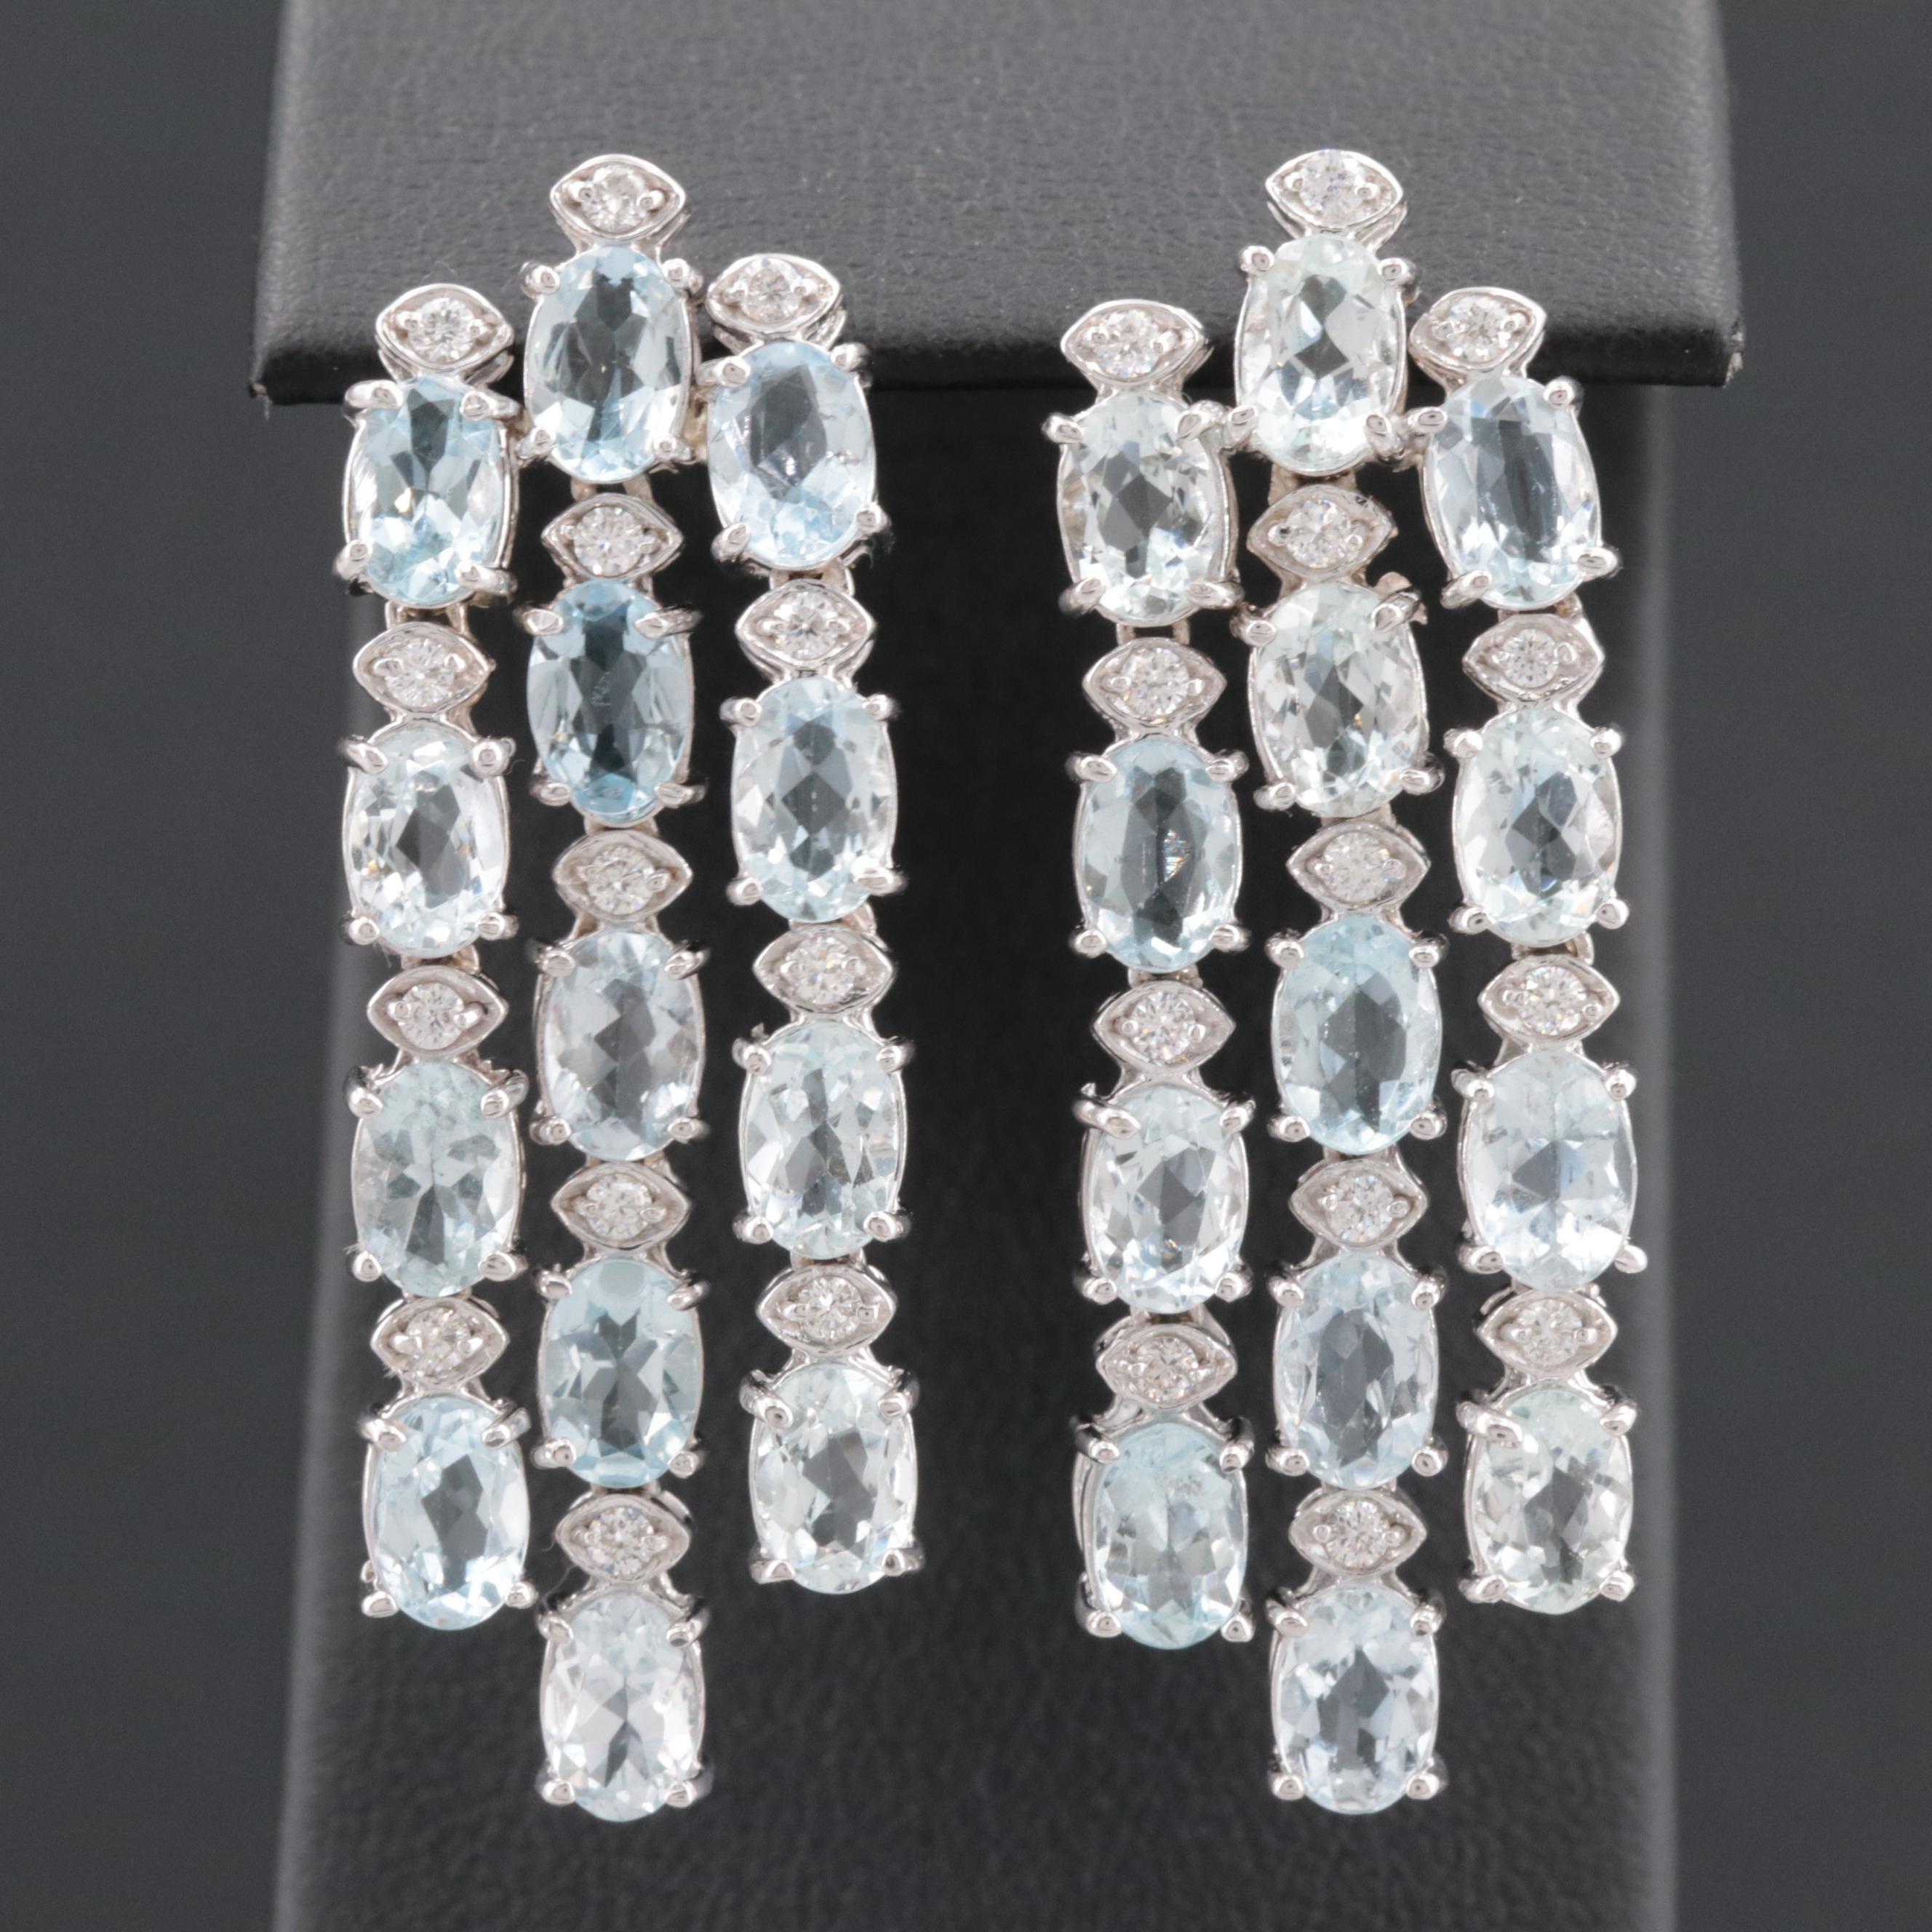 18K White Gold Aquamarine and Diamond Chandelier Earrings